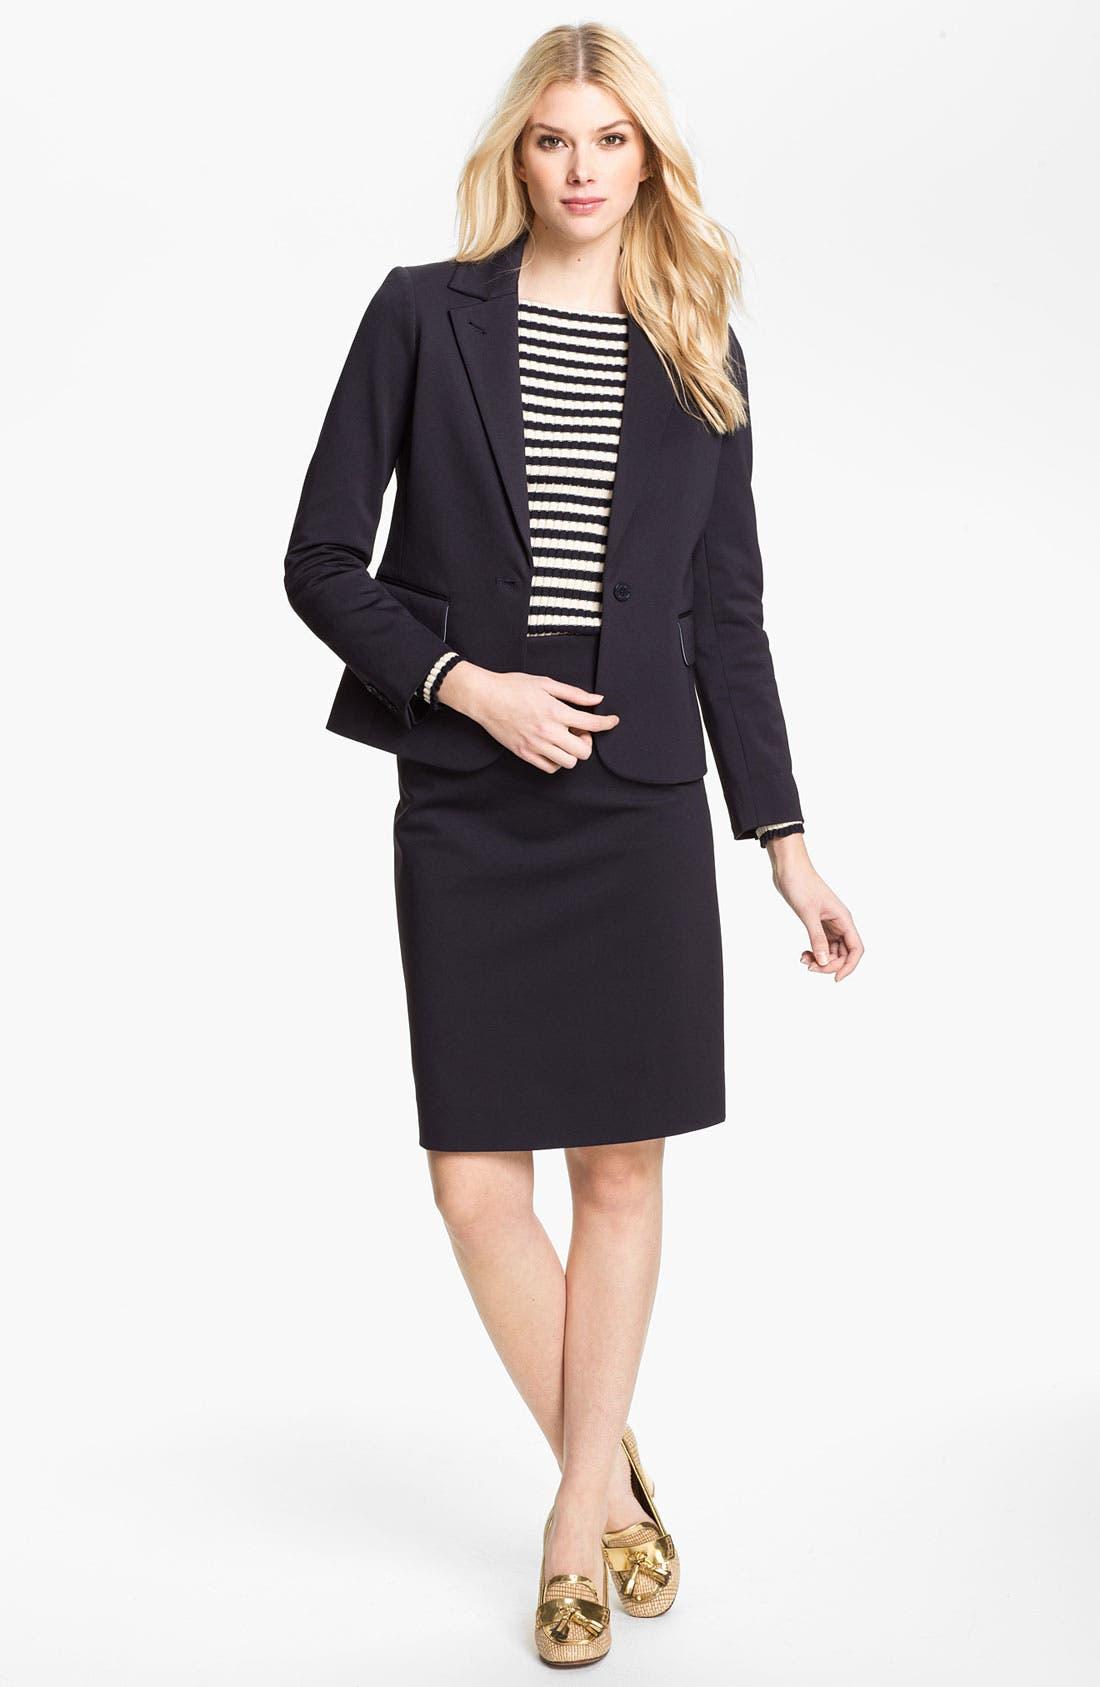 Alternate Image 1 Selected - Tory Burch 'Isabella' Jacket